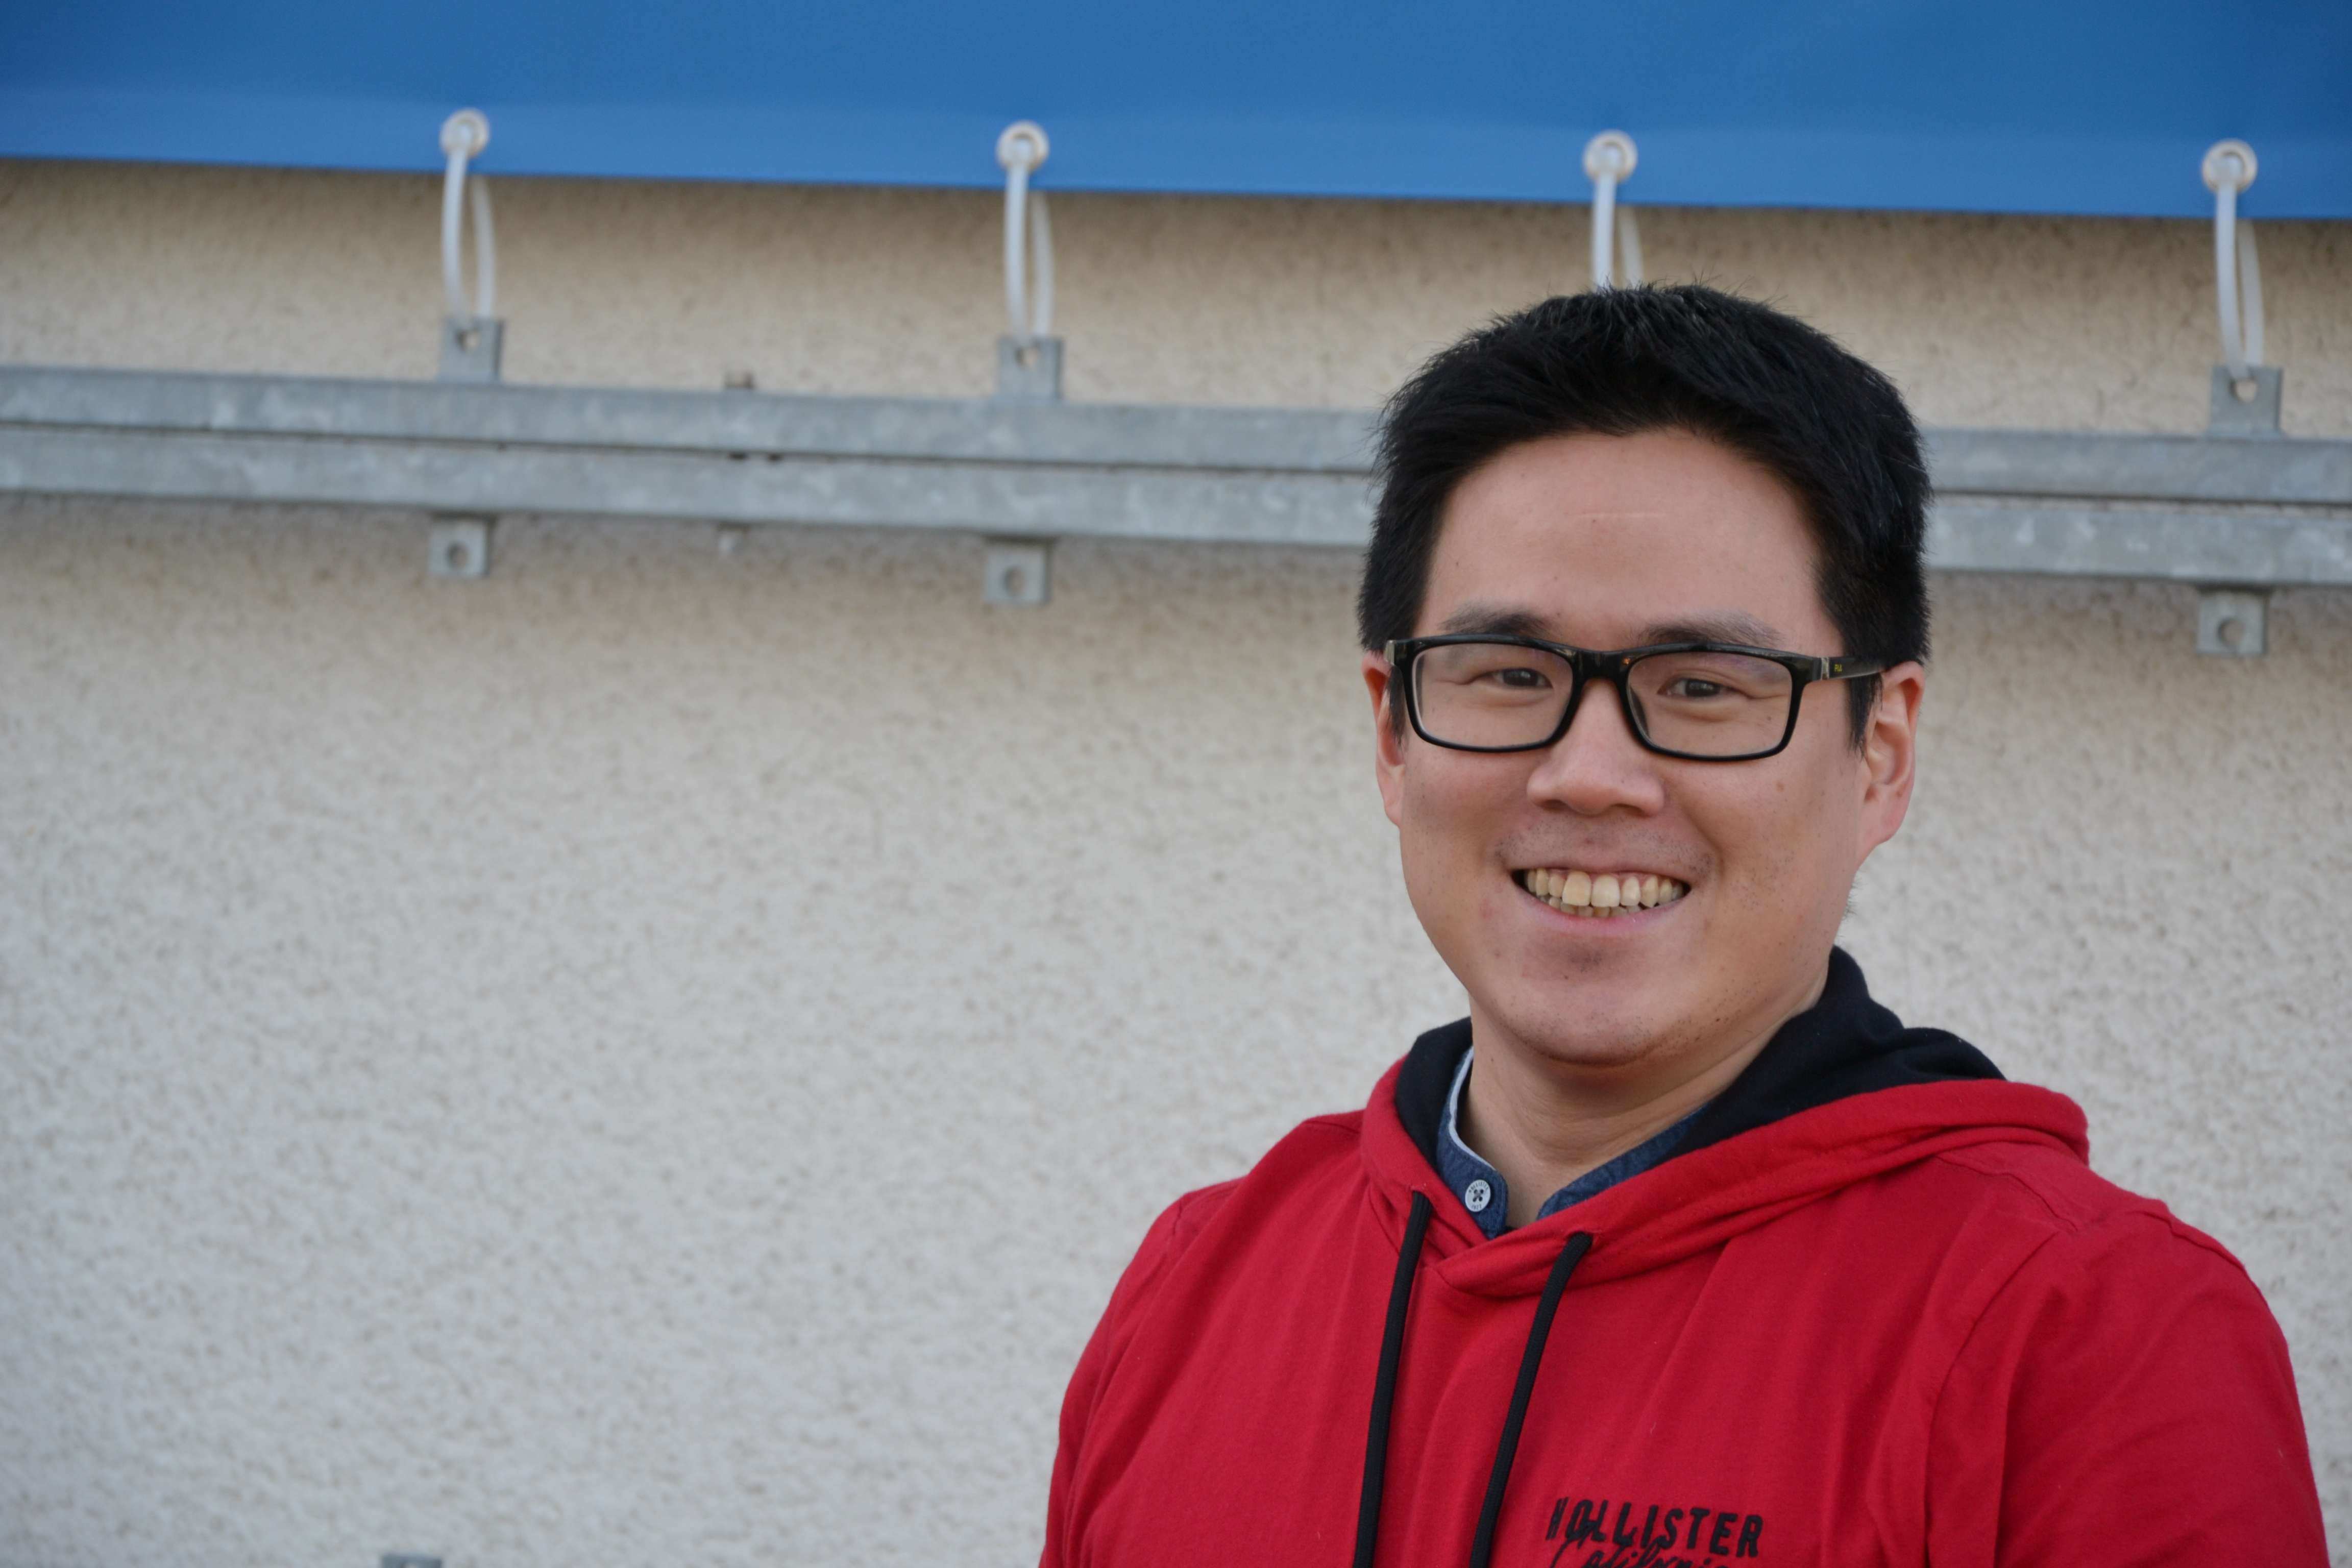 Picture: Yutsung Tsai, phd supervisor group leader at HZB.